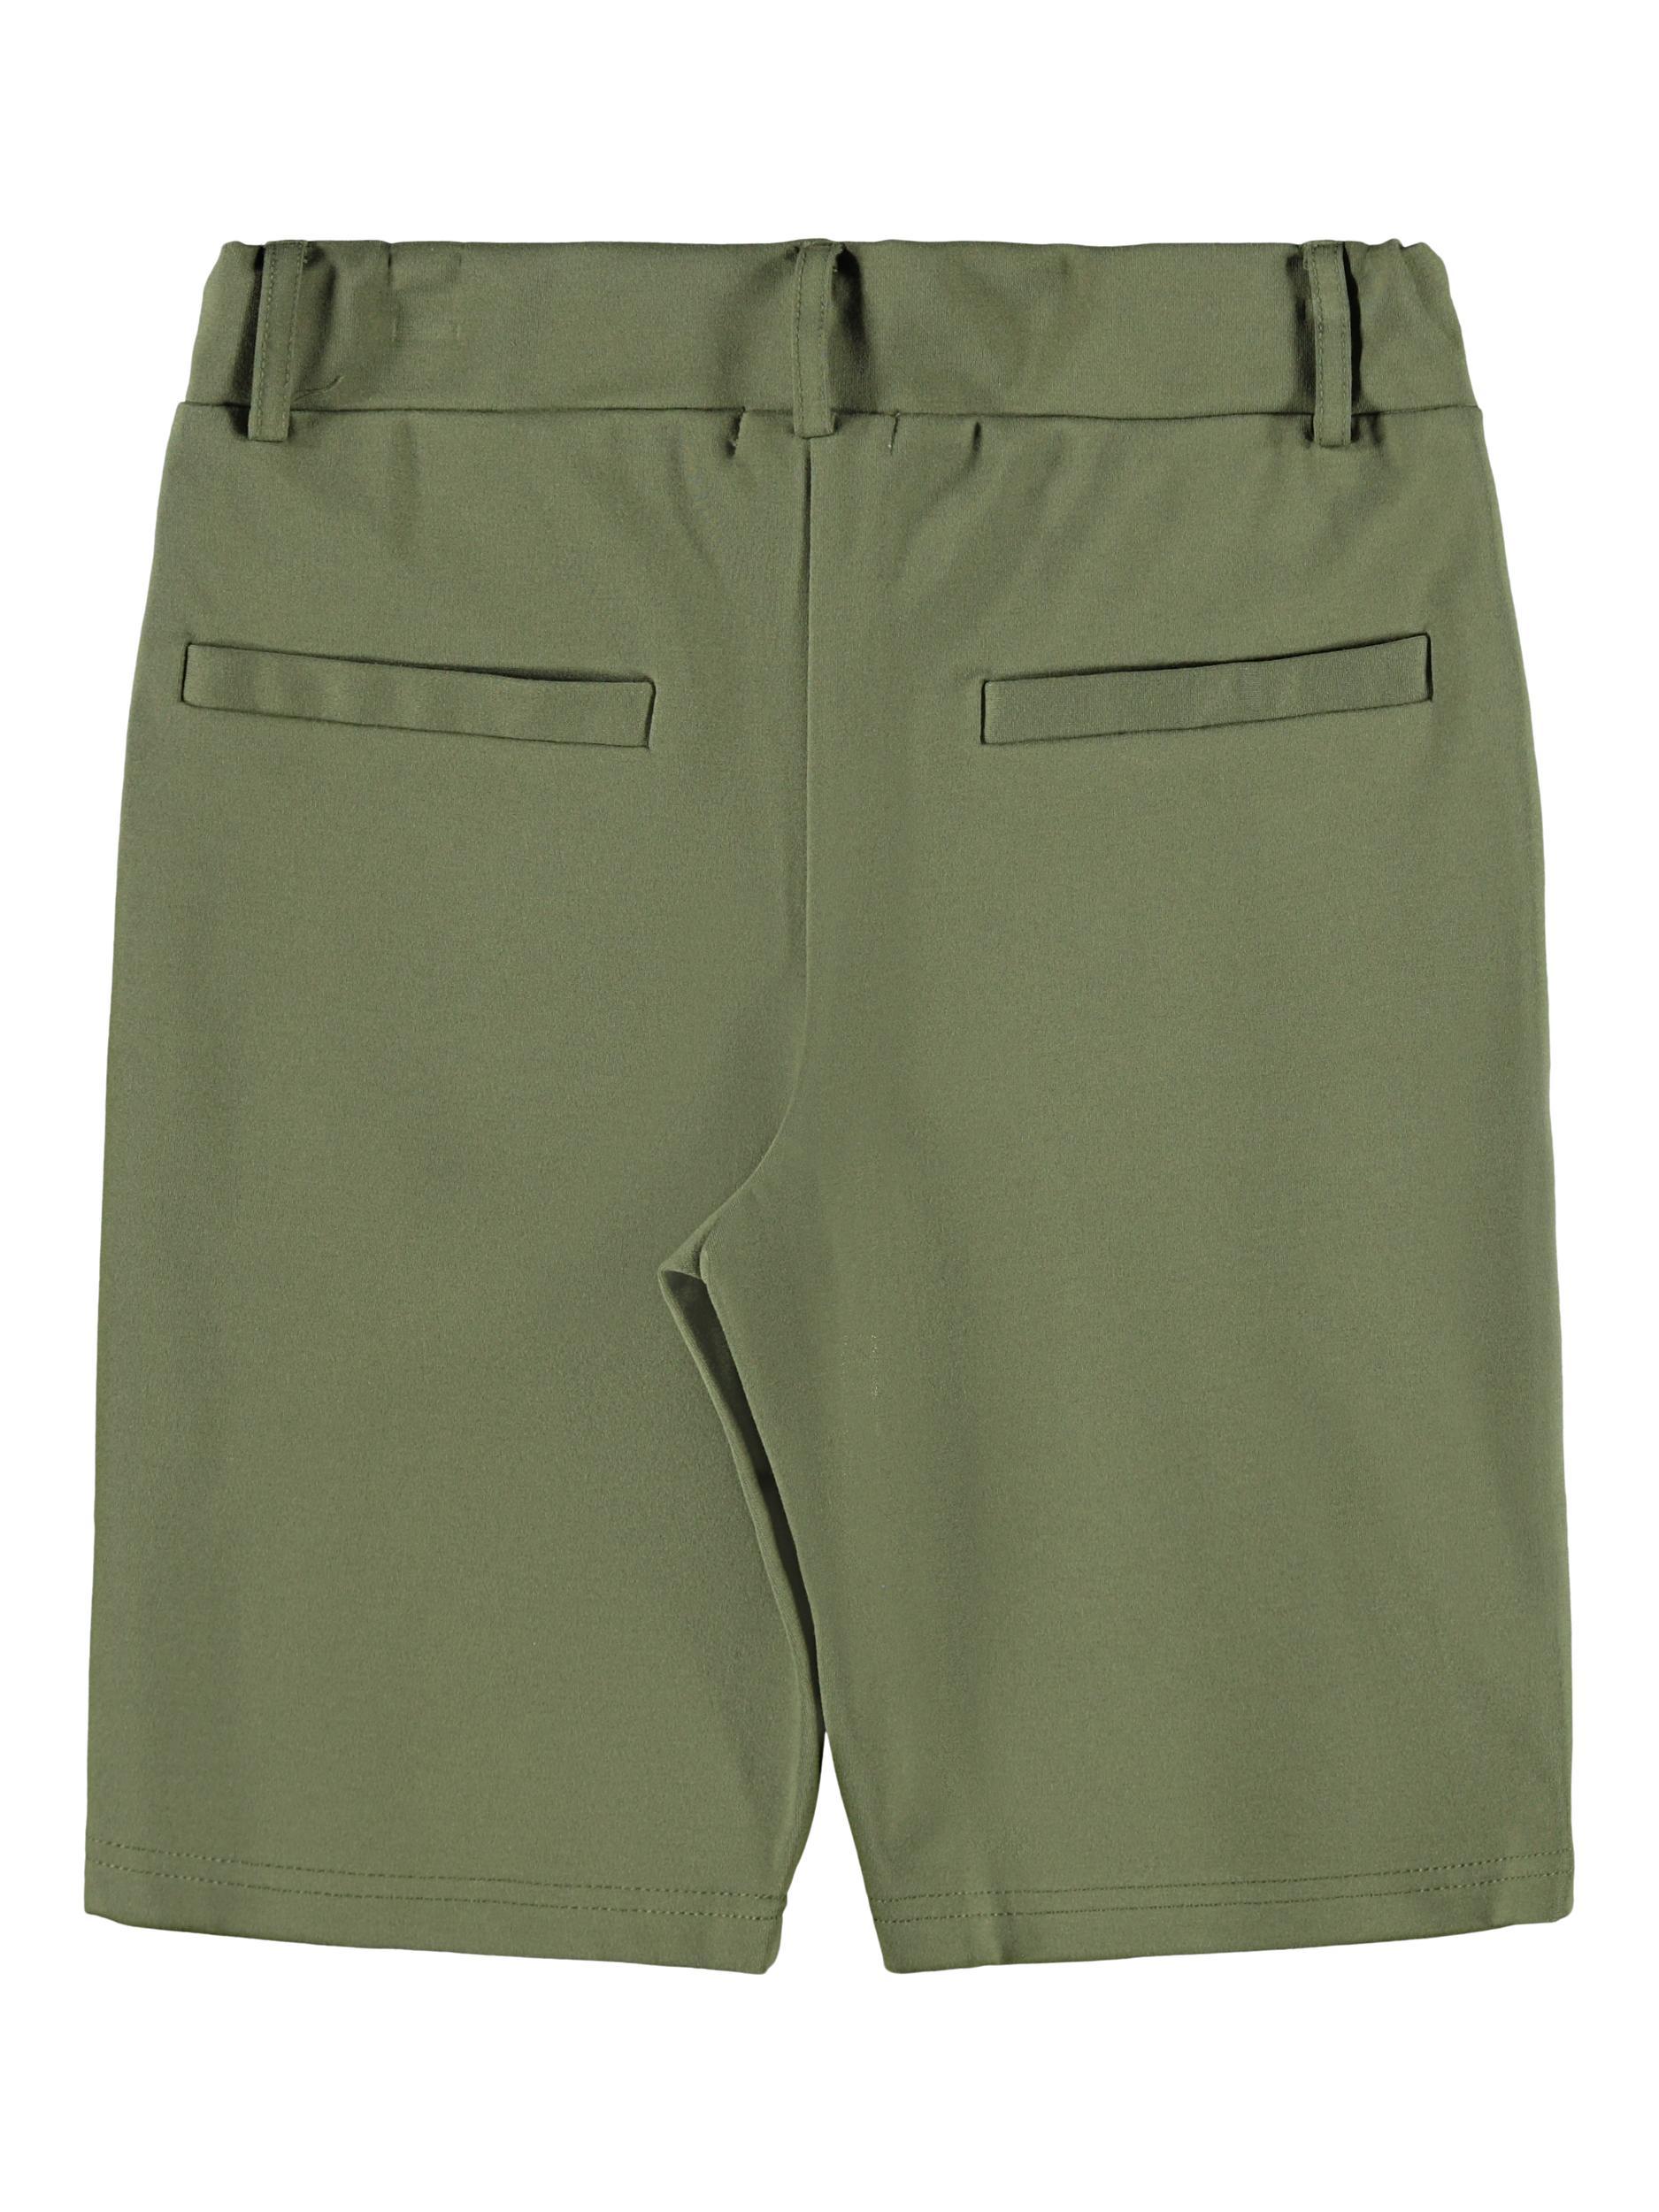 Name It Singo shorts, ivy green, 128